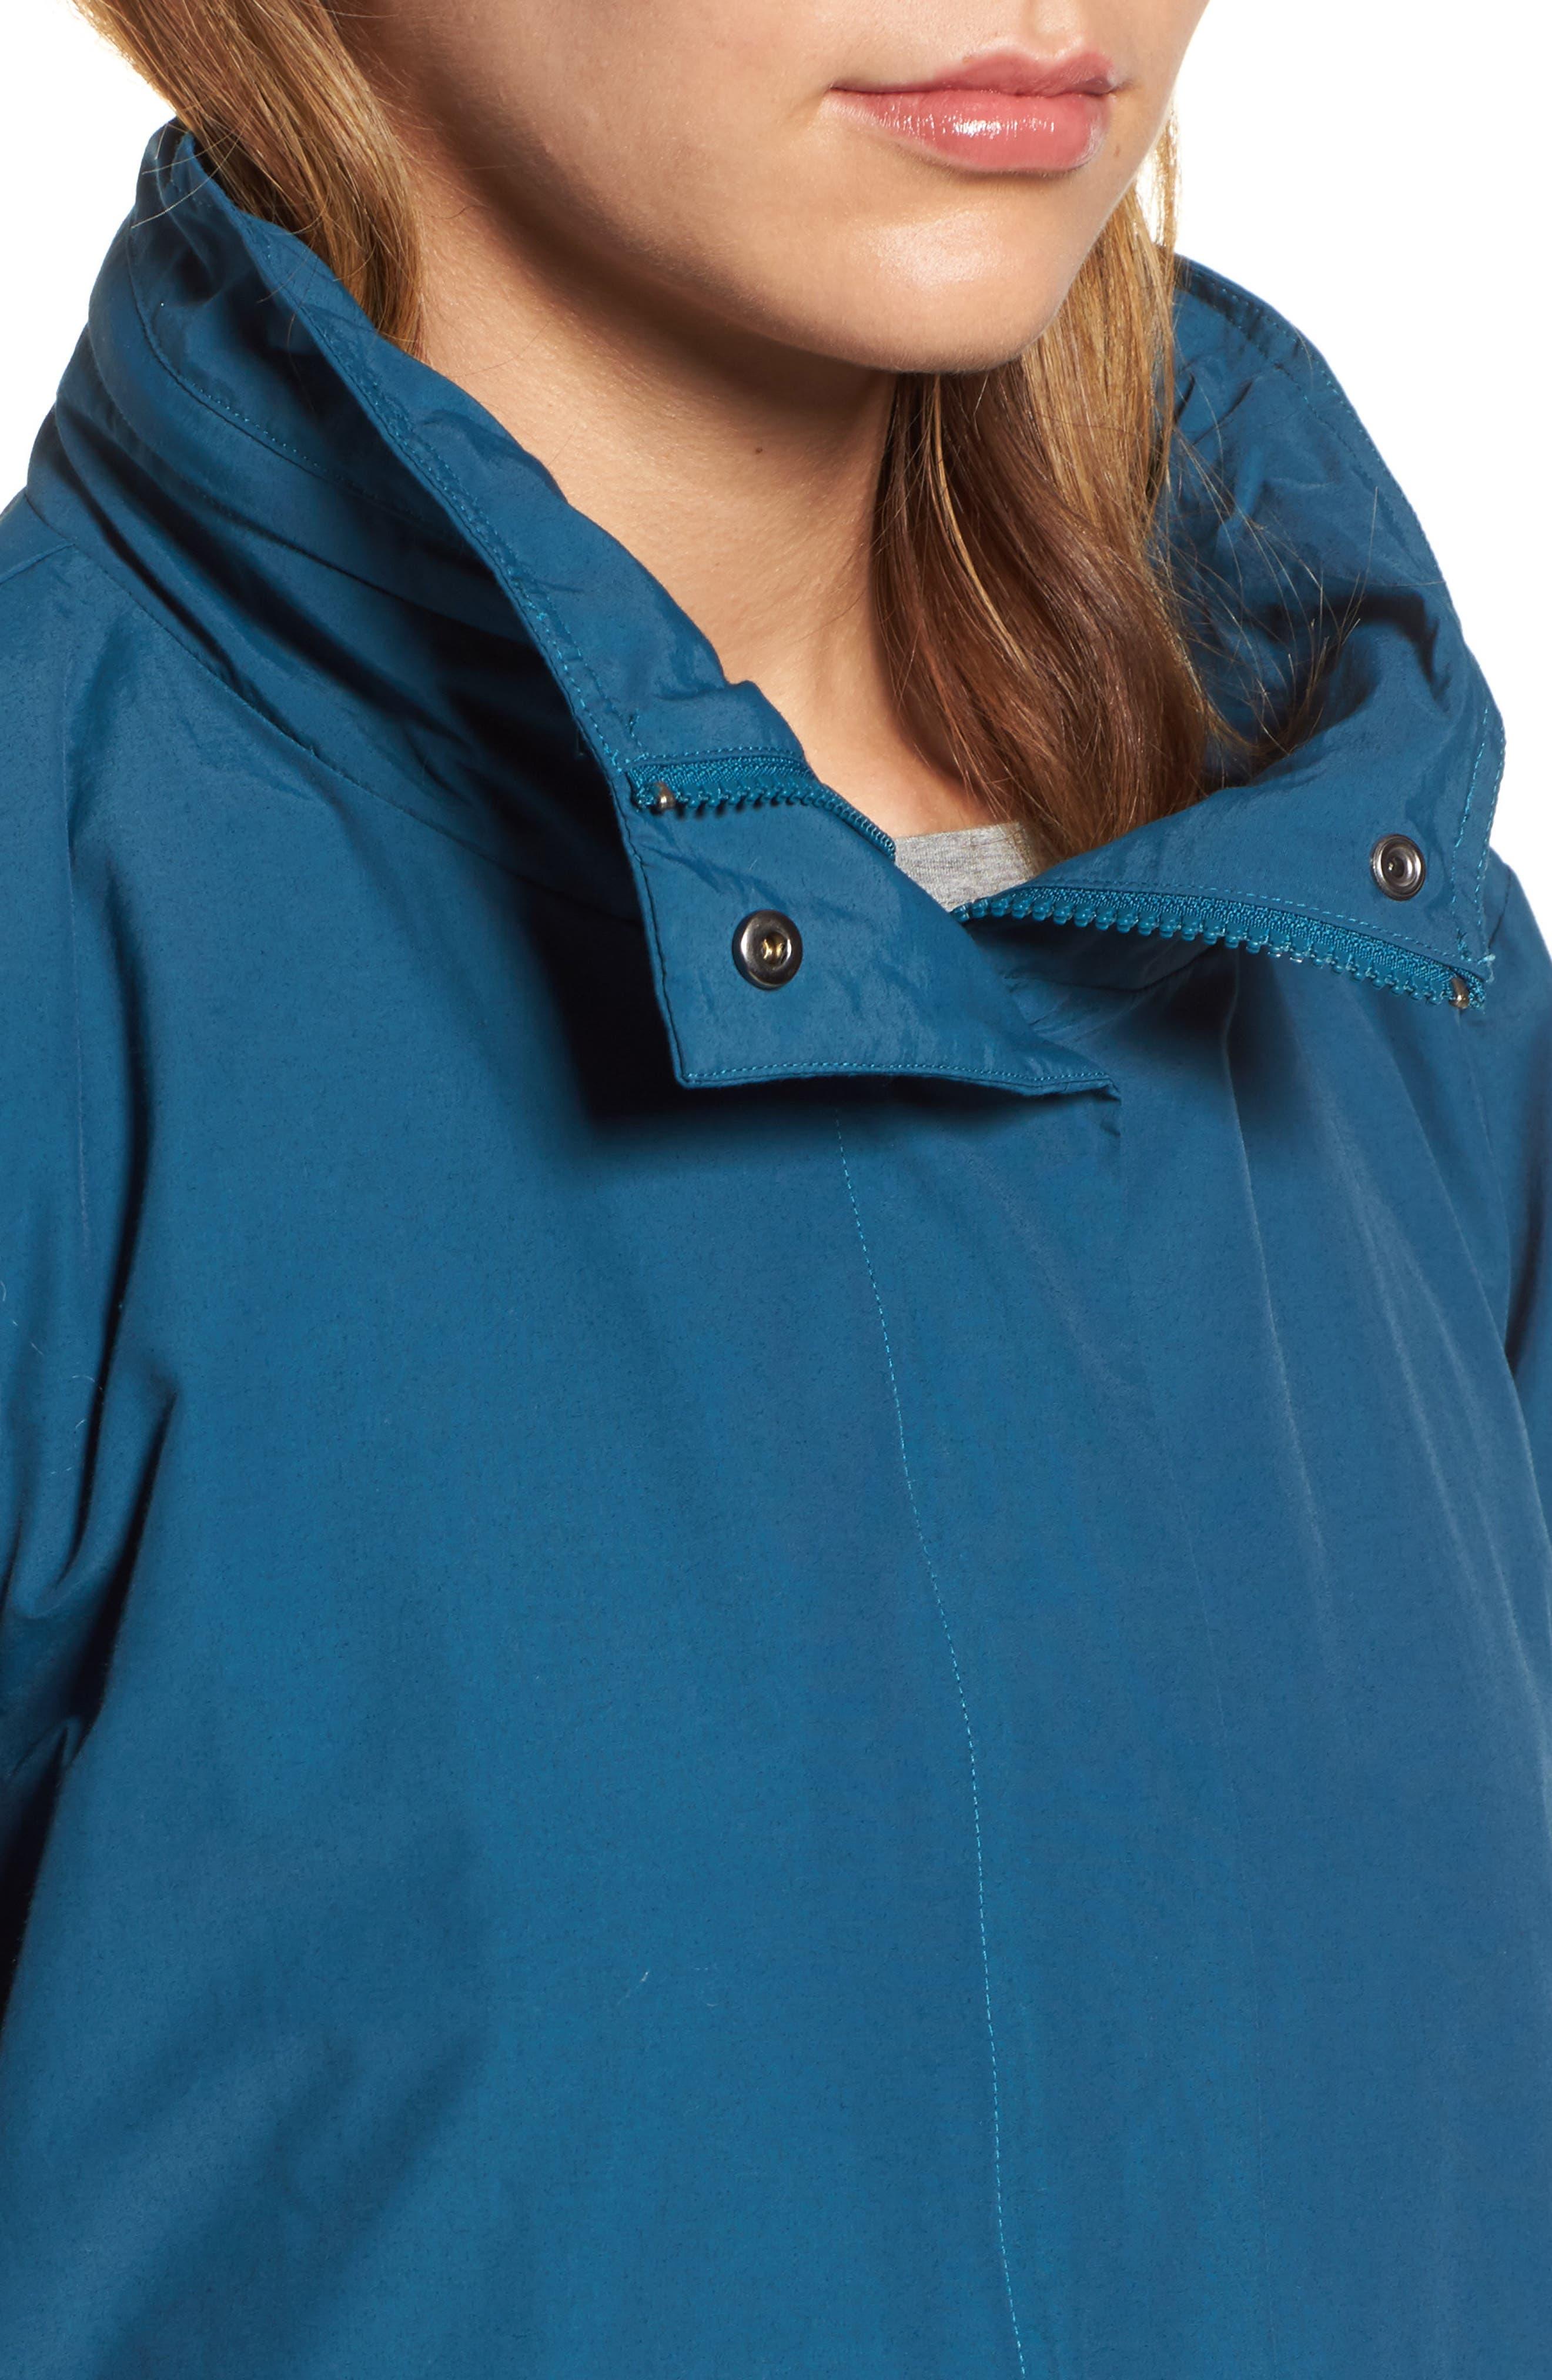 Hooded Utility Jacket,                             Alternate thumbnail 4, color,                             Blue Spruce